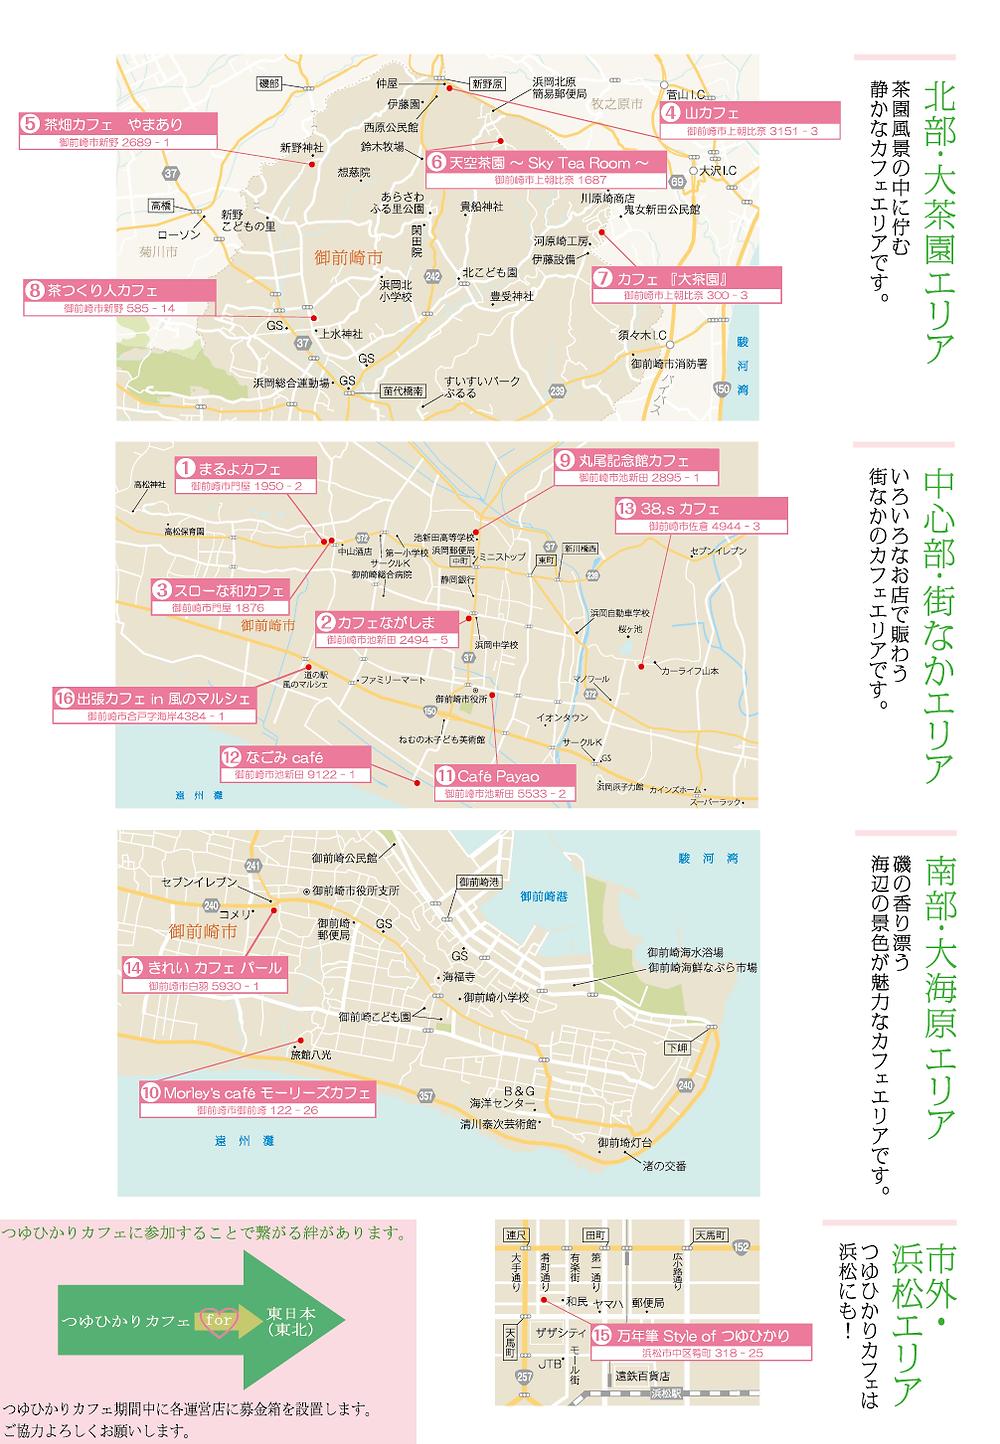 地図詳細.png